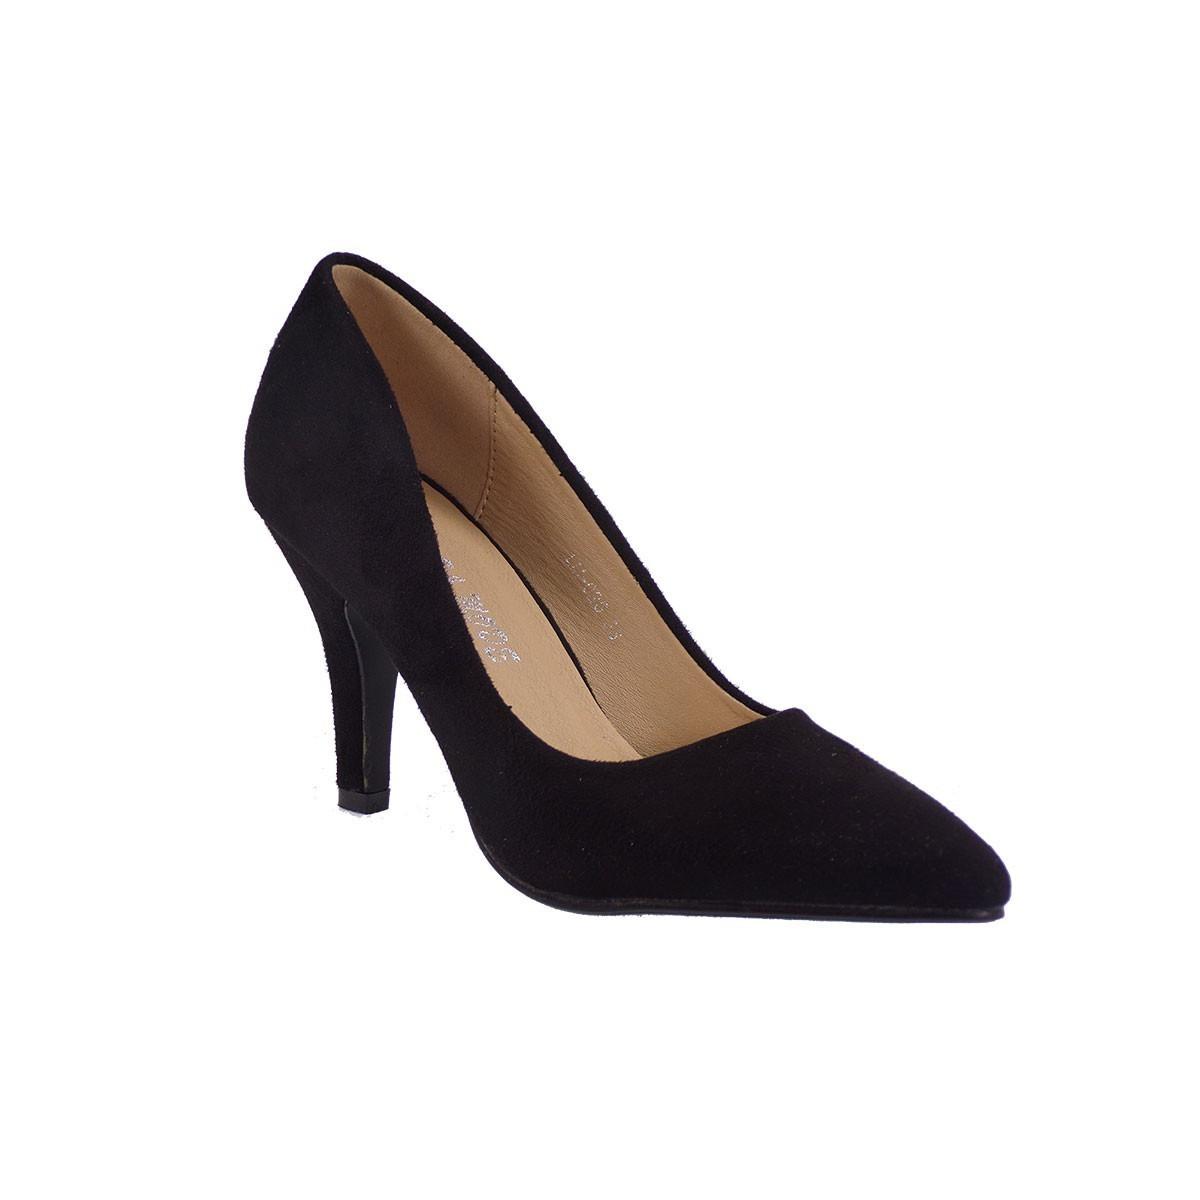 Bagiota Shoes Γυναικεία Παπούτσια Γόβες LM026 Μαύρο